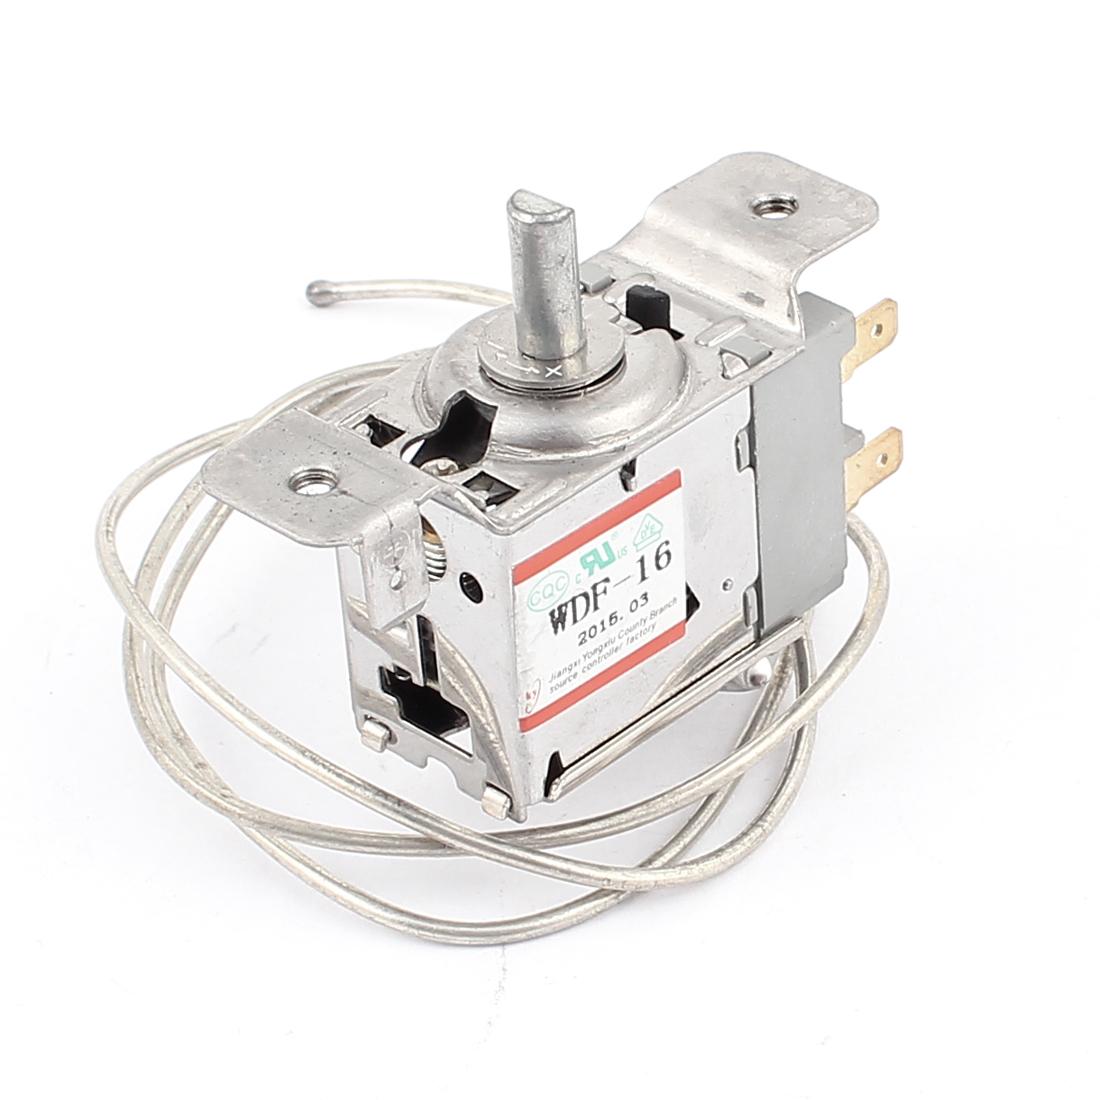 WDF-16 Refrigerator 6mm Dia Shaft Temperature Controller Attemperator 60cm Wire